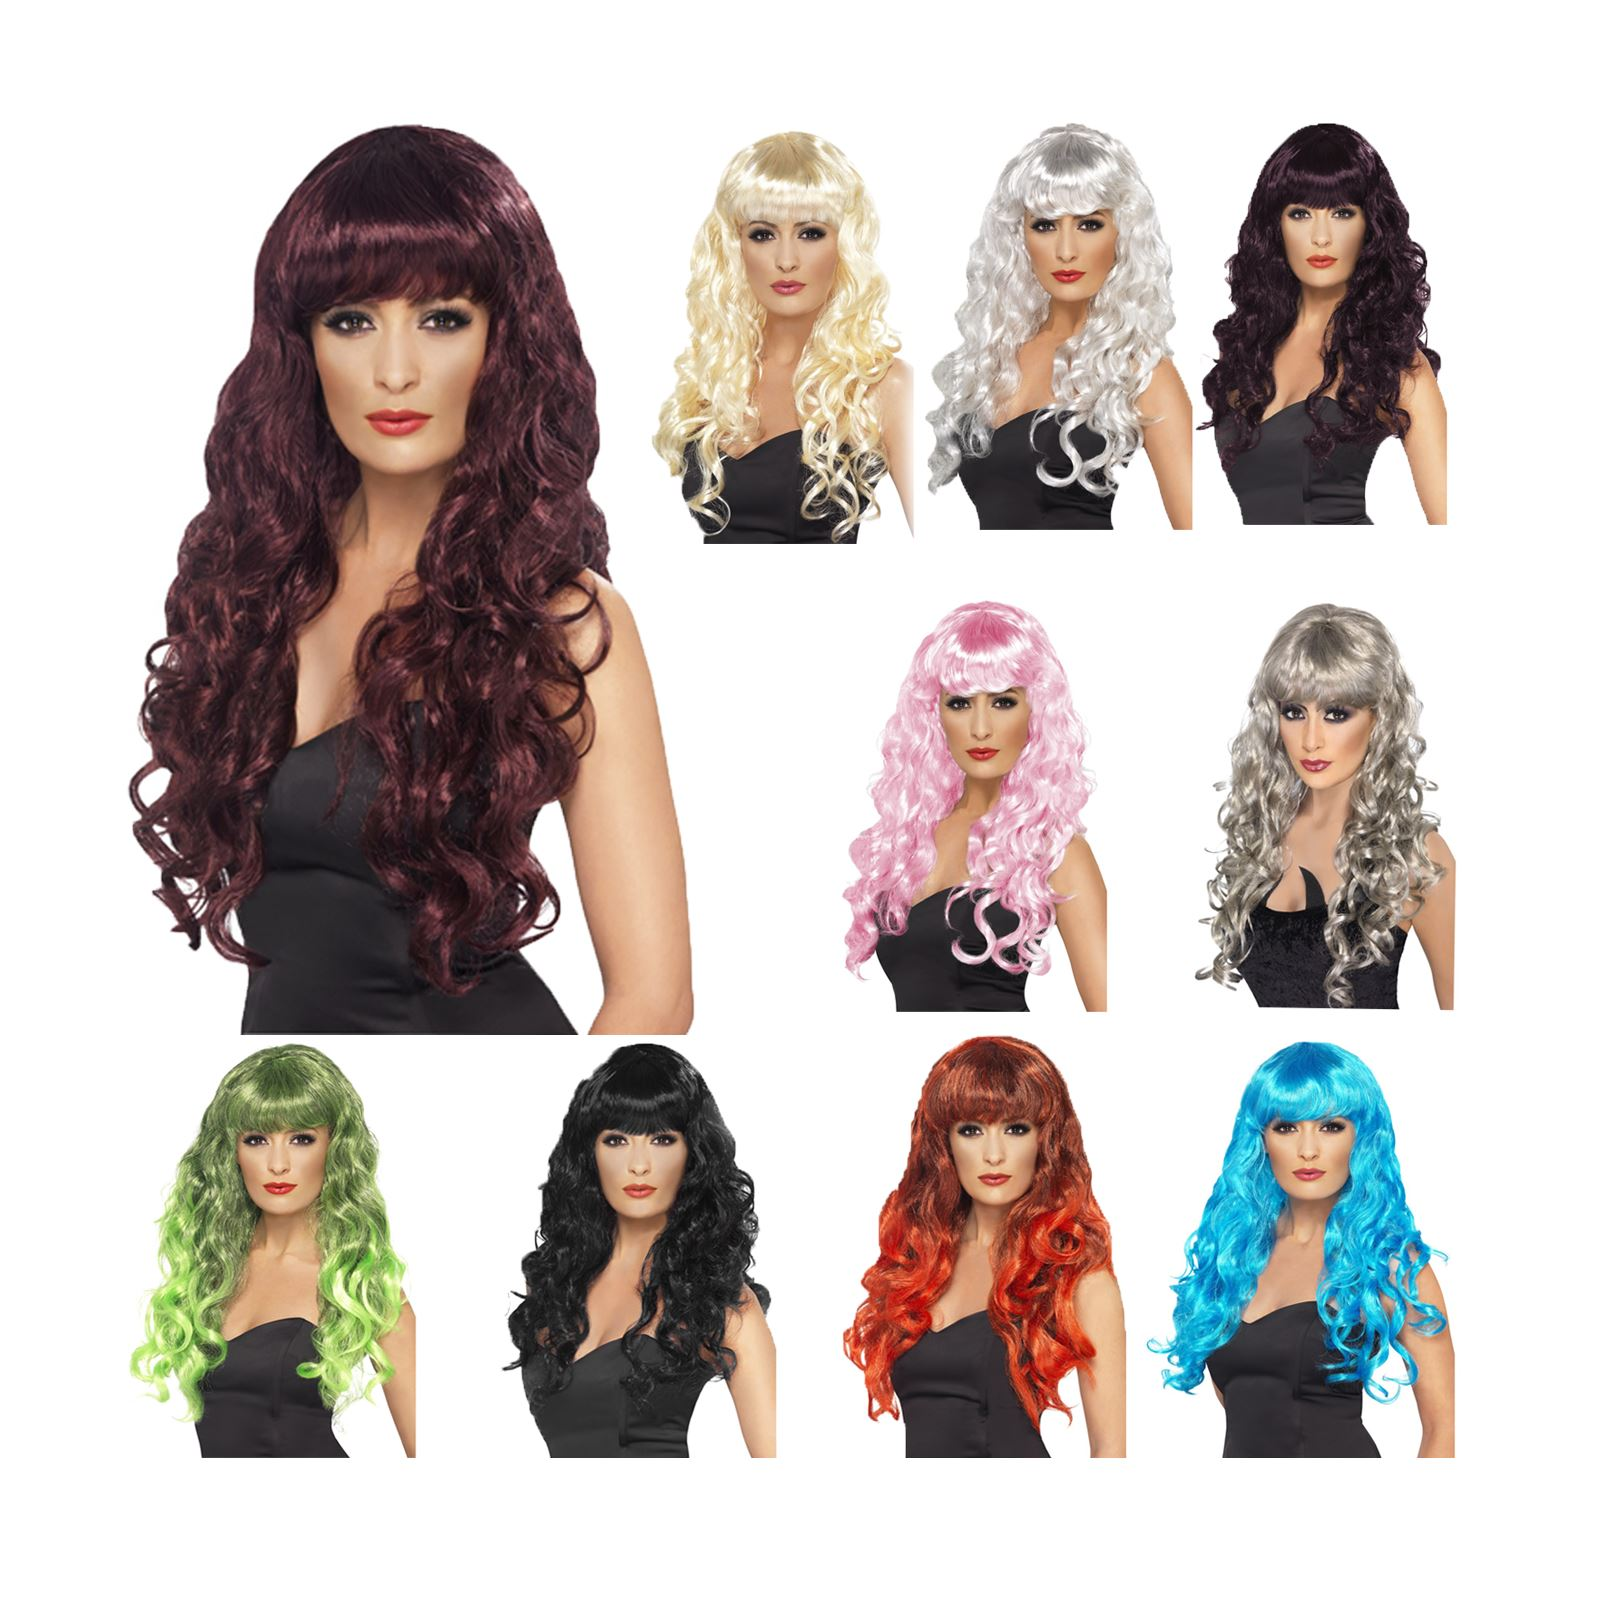 New Ladies Siren Wig Plum Purple Long Curly Gothic Halloween Fancy Dress Glamour